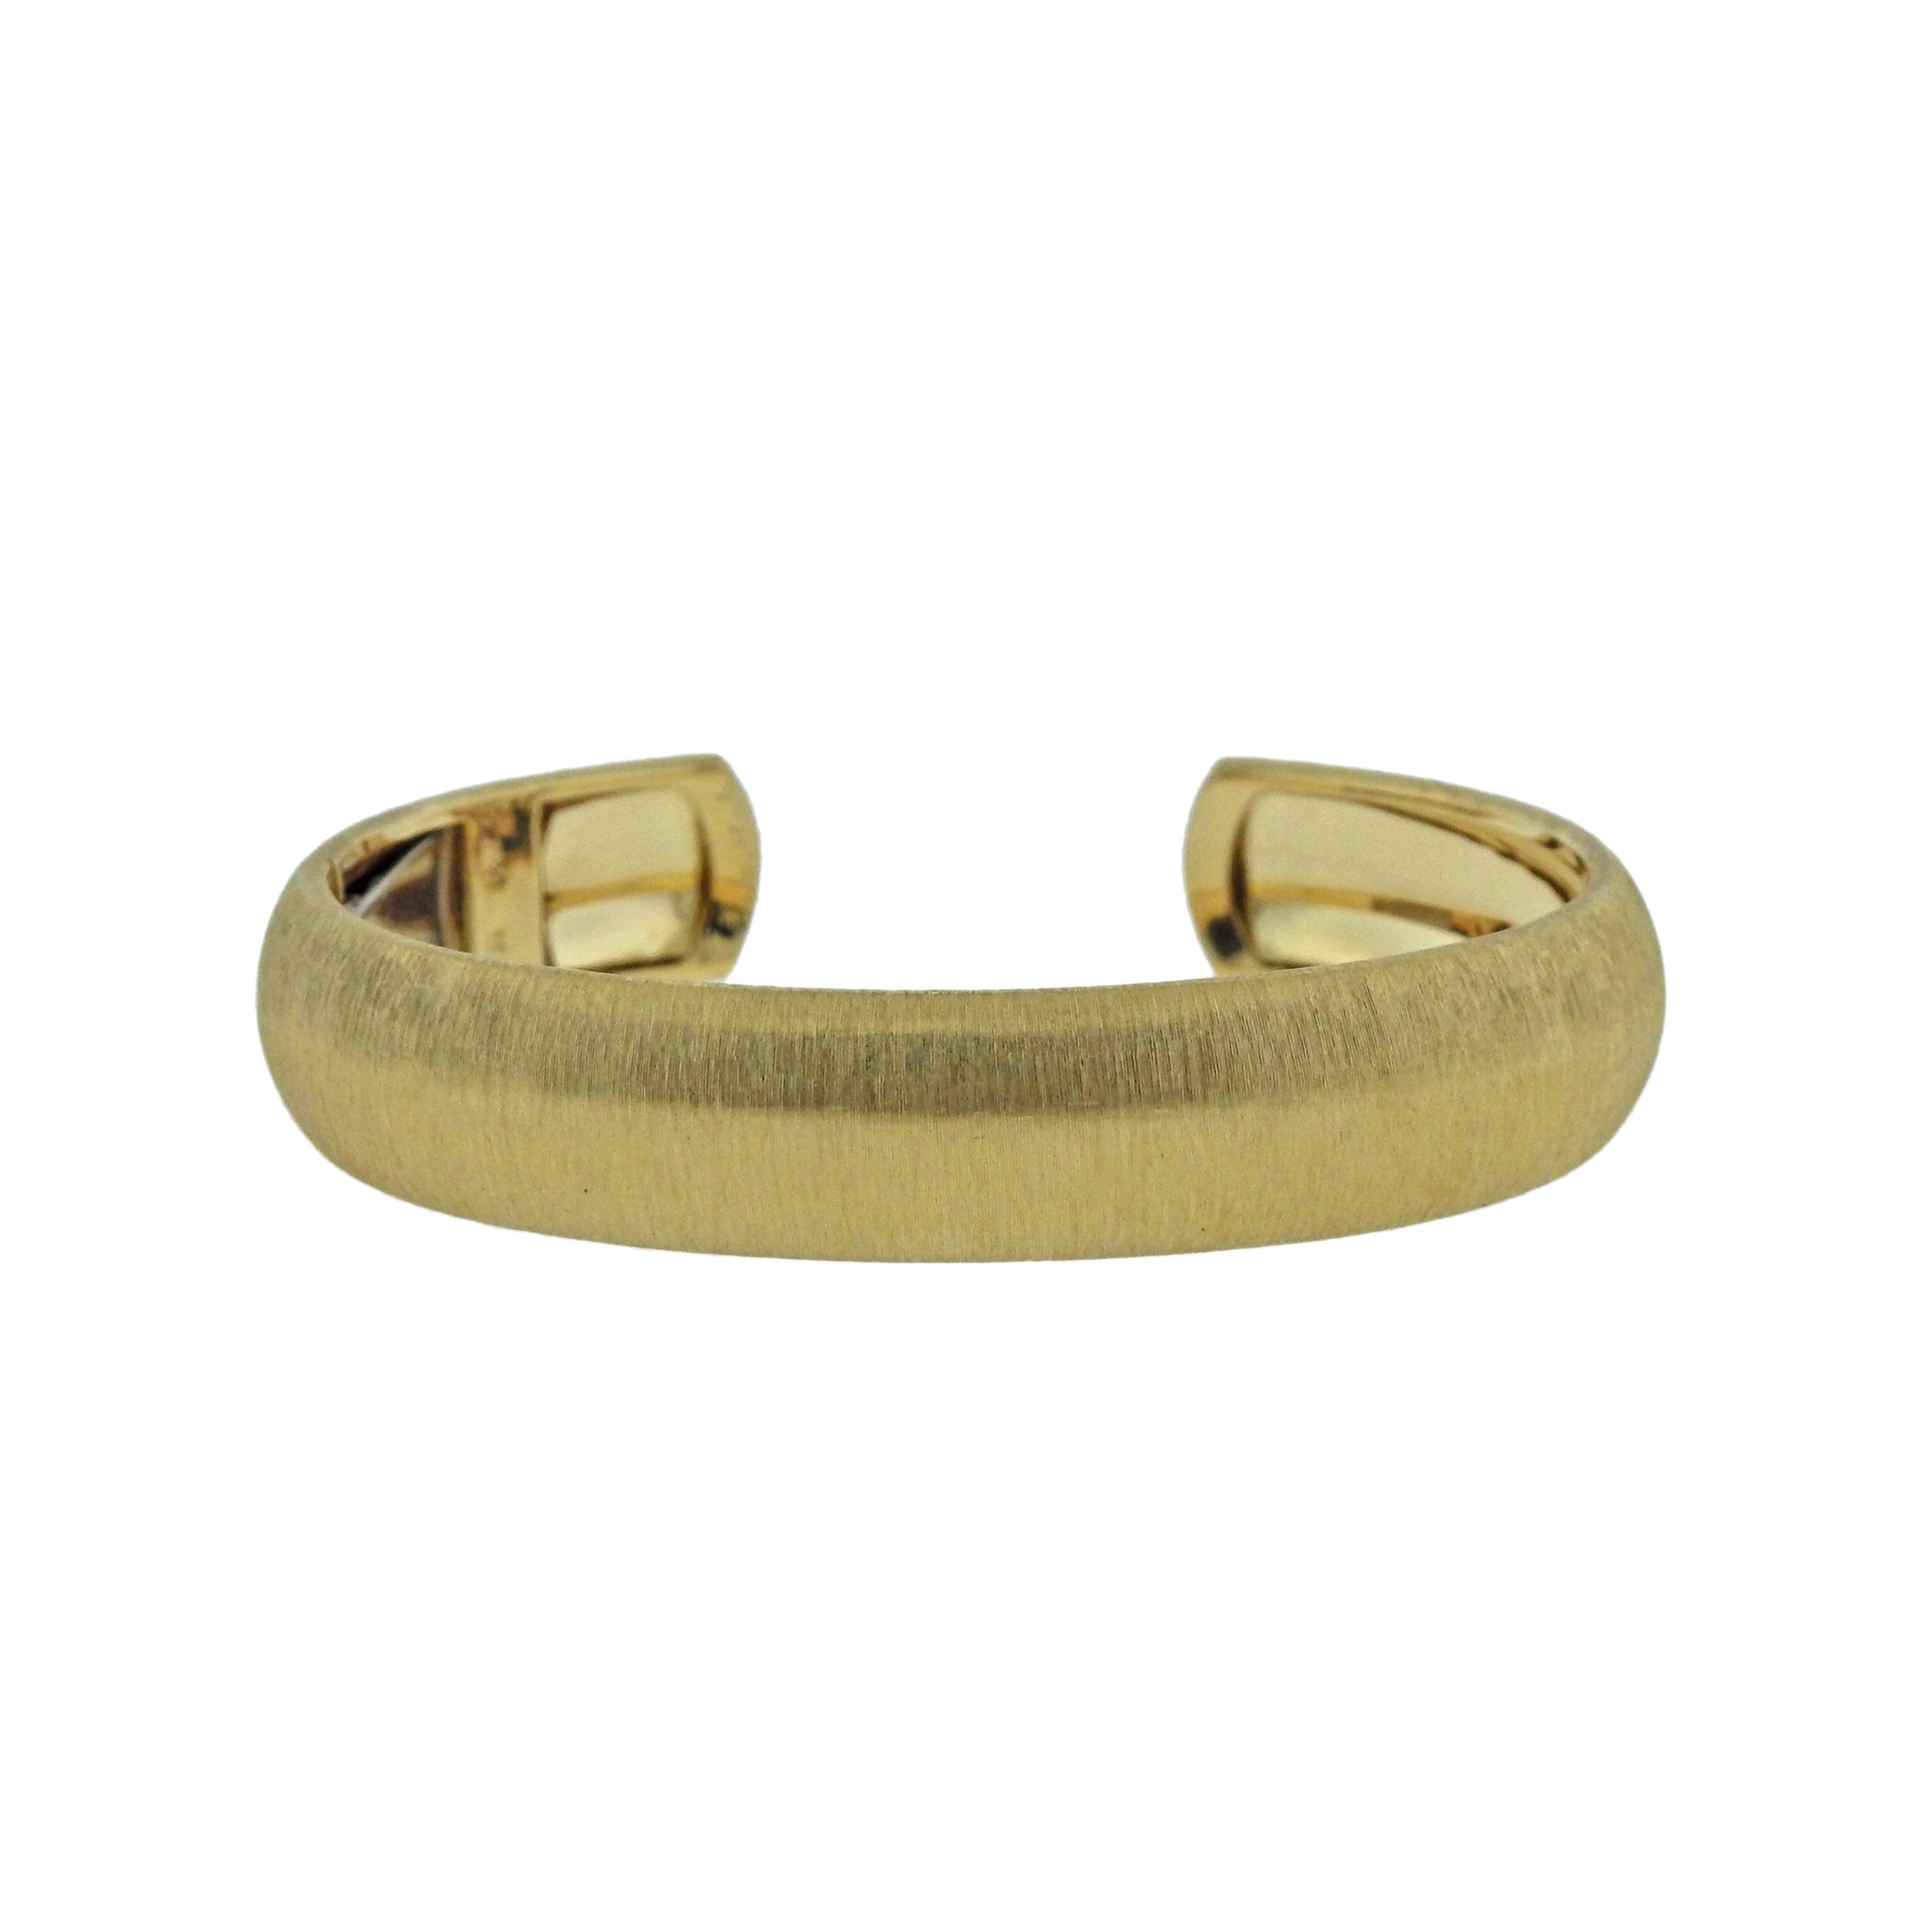 f297b5ca0c2b Buccellati Classic Yellow Gold Cuff Bracelet For Sale at 1stdibs